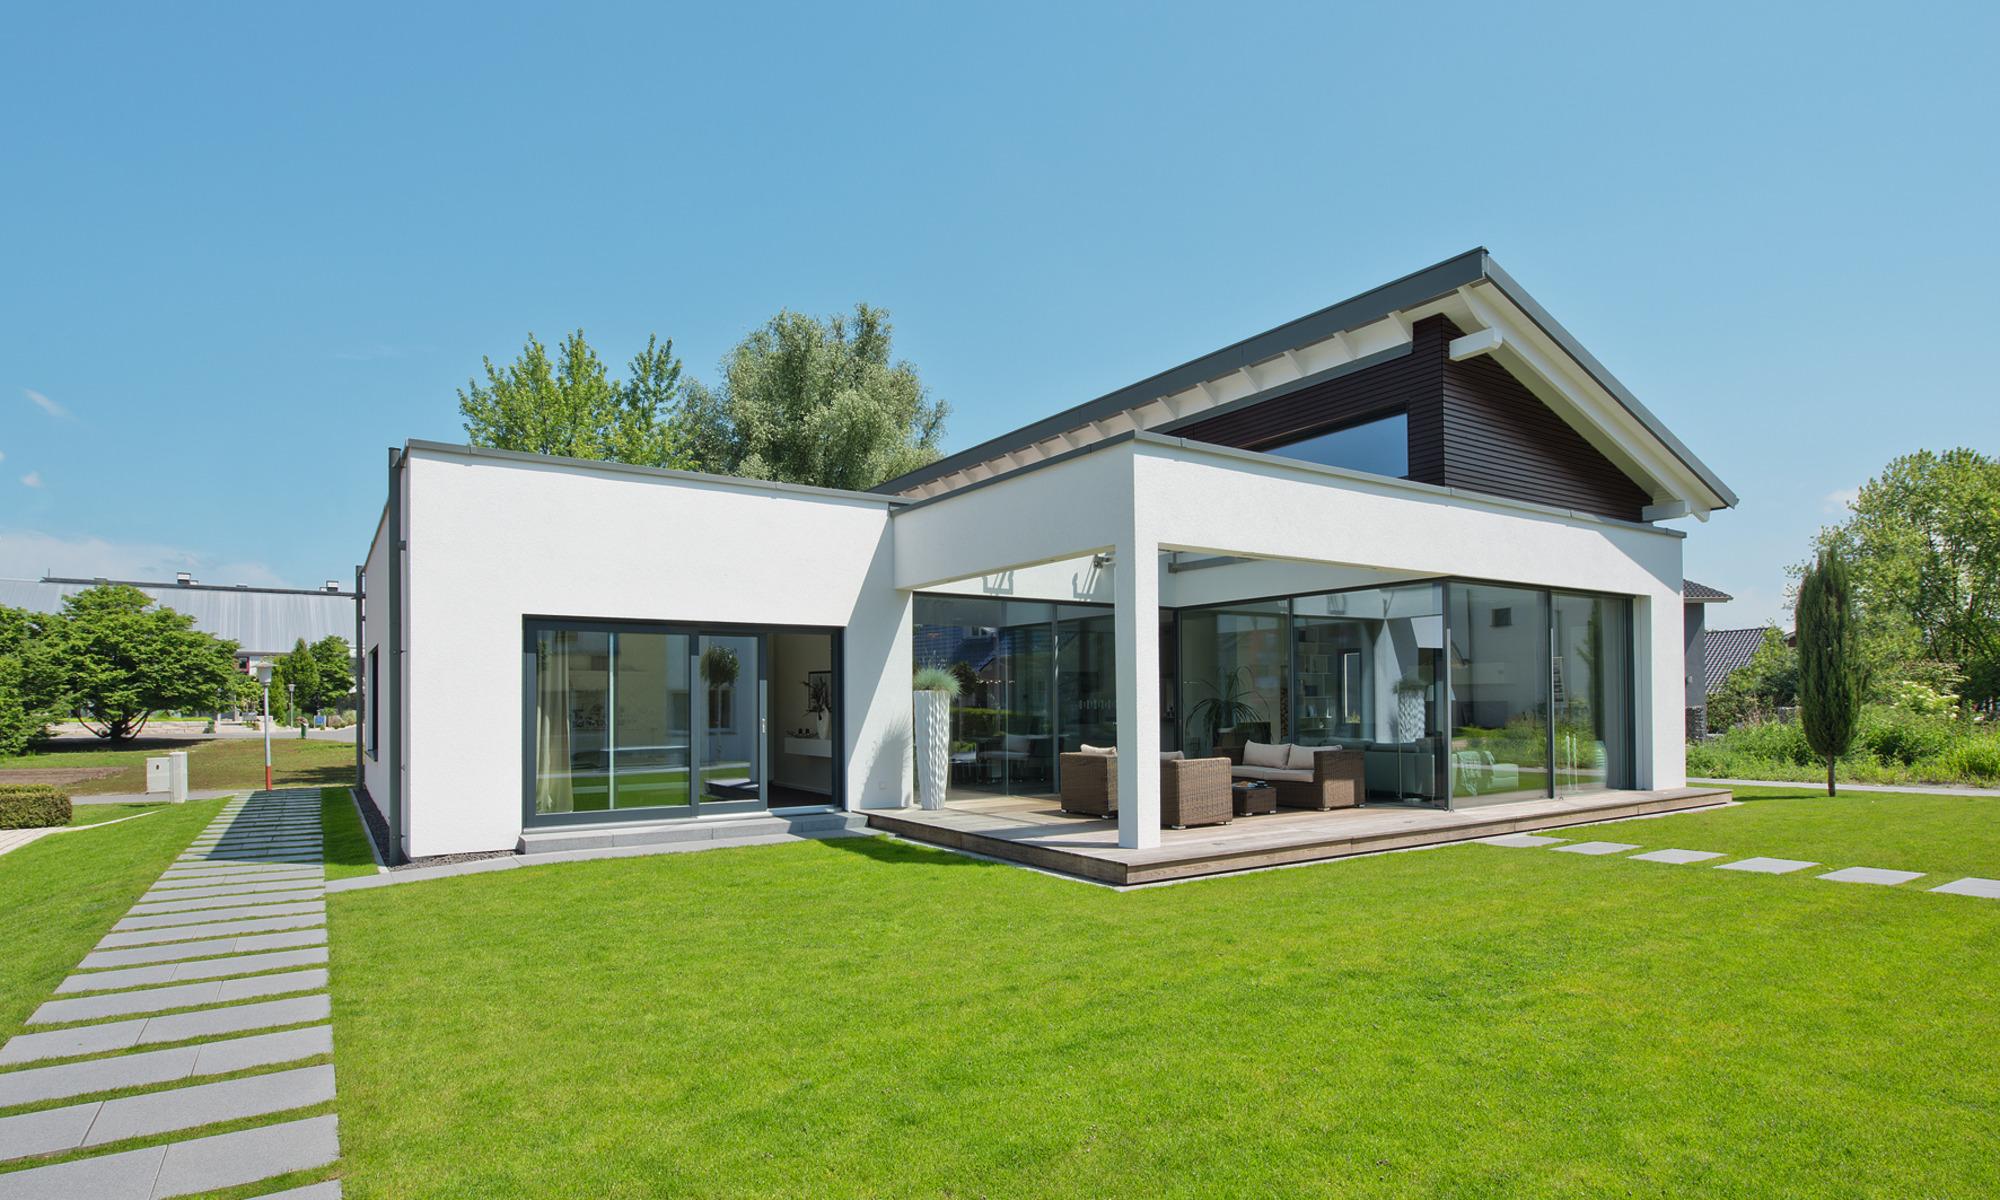 Architect-designed 1-storey prefab home